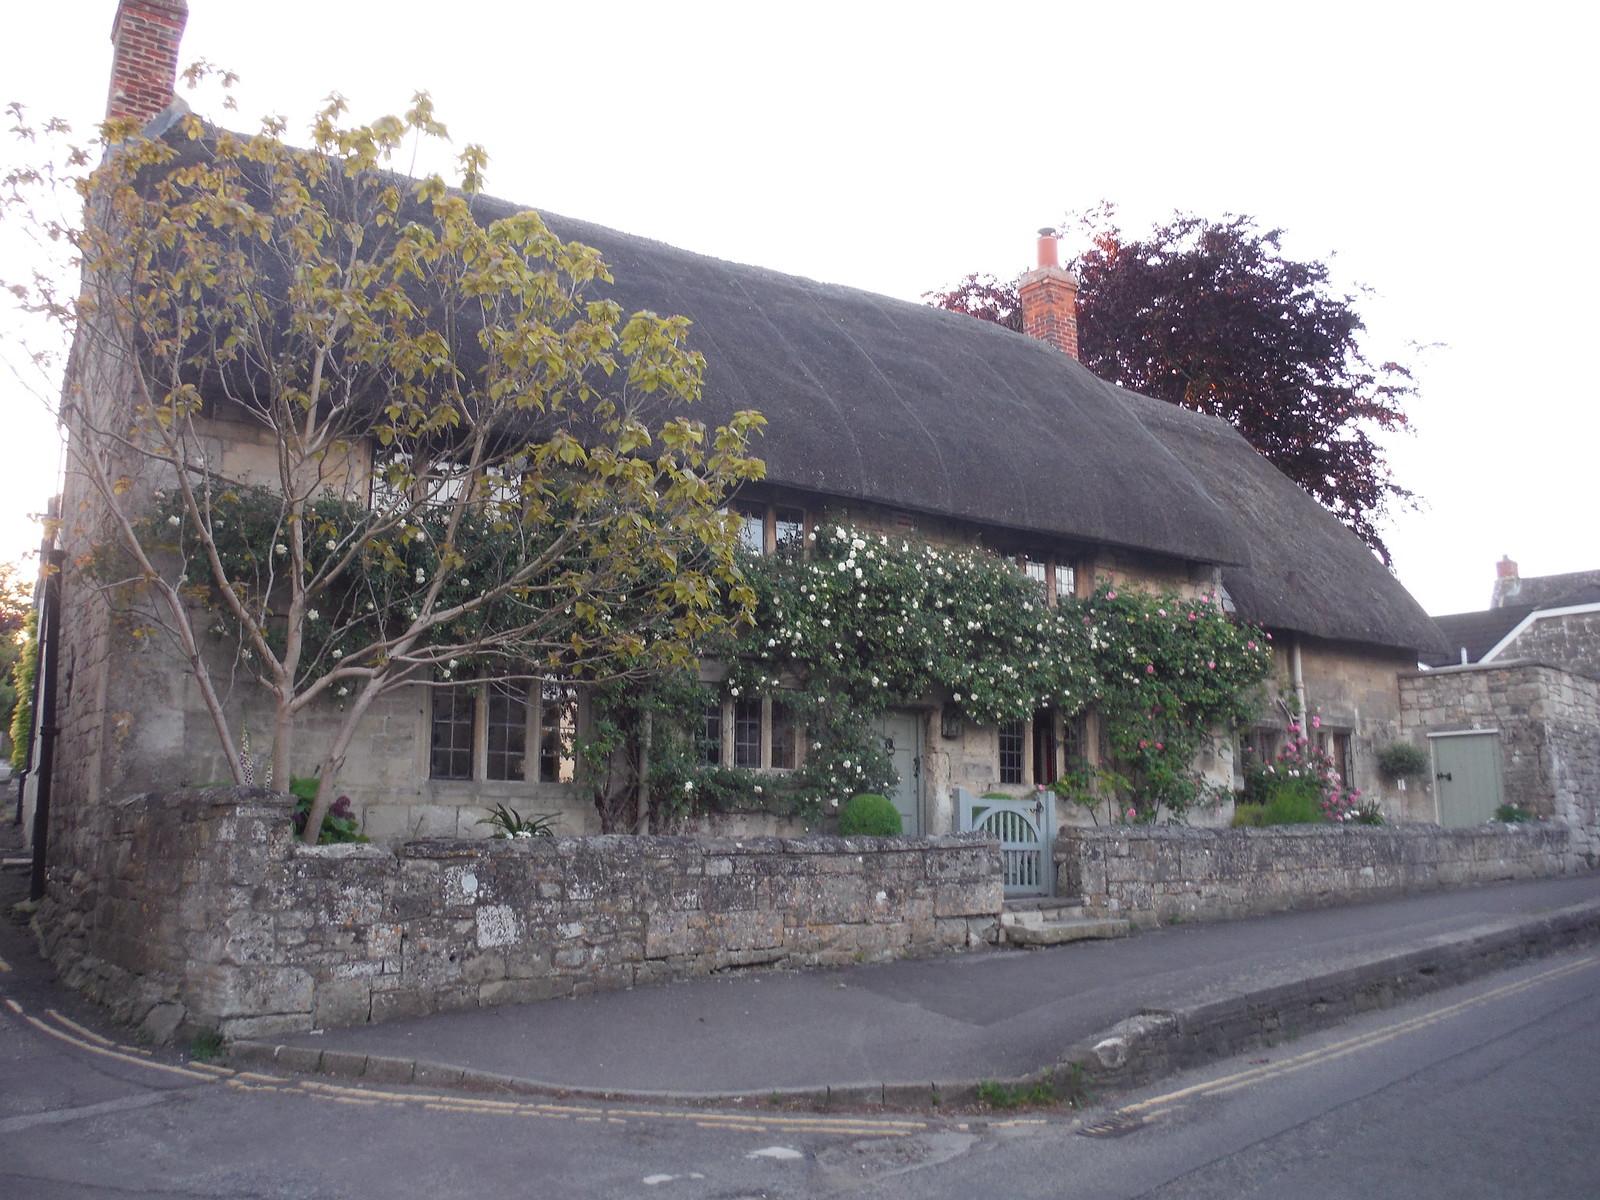 House in Tisbury SWC Walk 249 Tisbury Circular via Dinton and Fovant